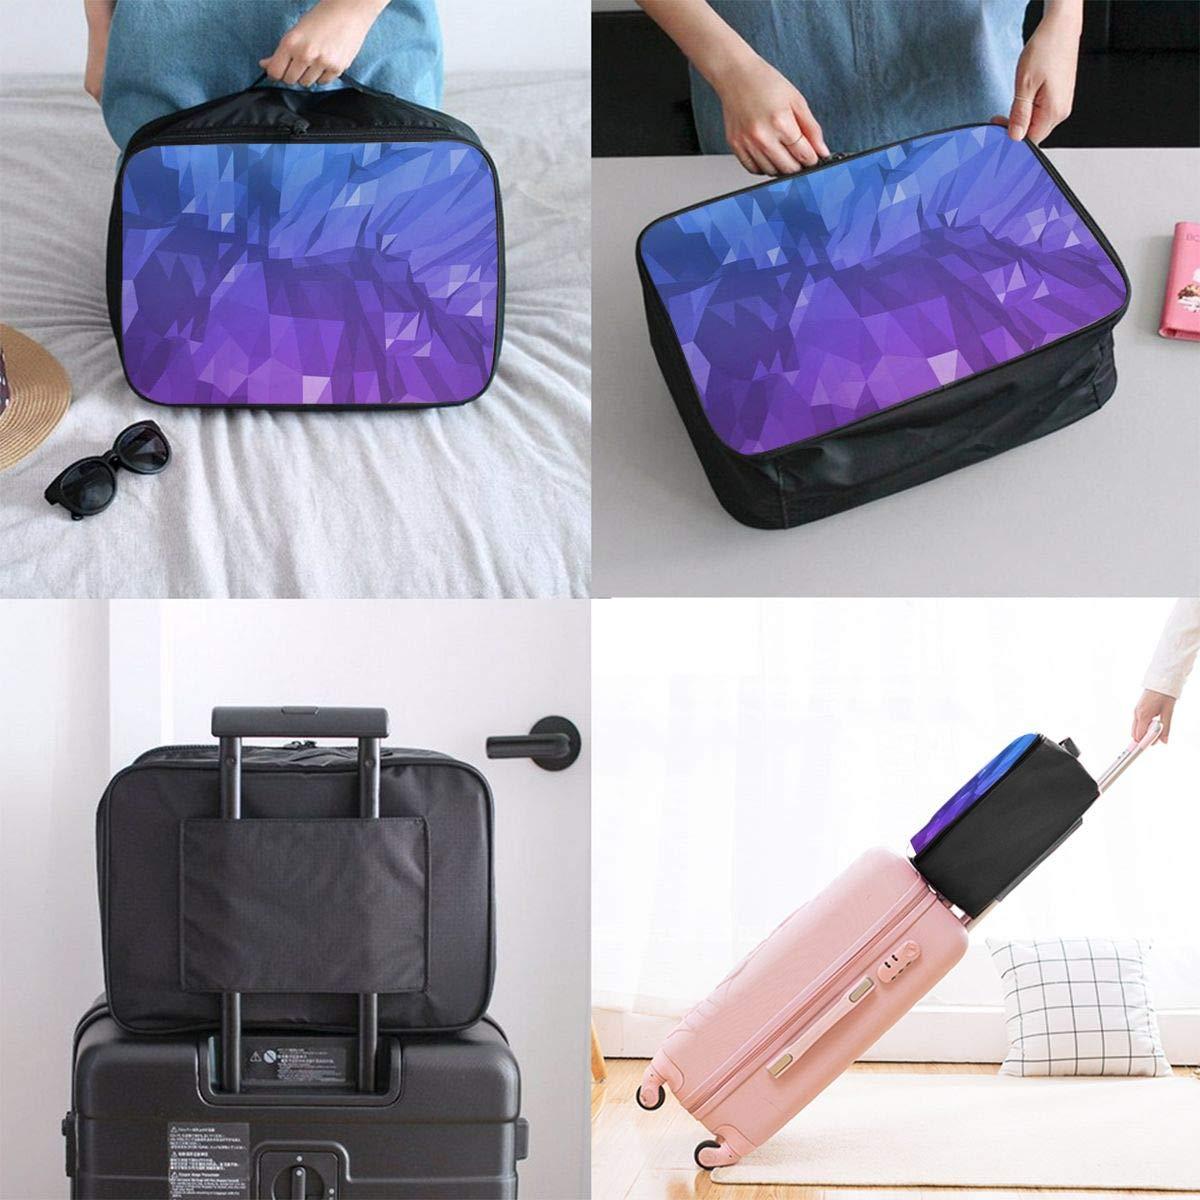 Travel Luggage Duffle Bag Lightweight Portable Handbag Colorful Crystal Pattern Large Capacity Waterproof Foldable Storage Tote